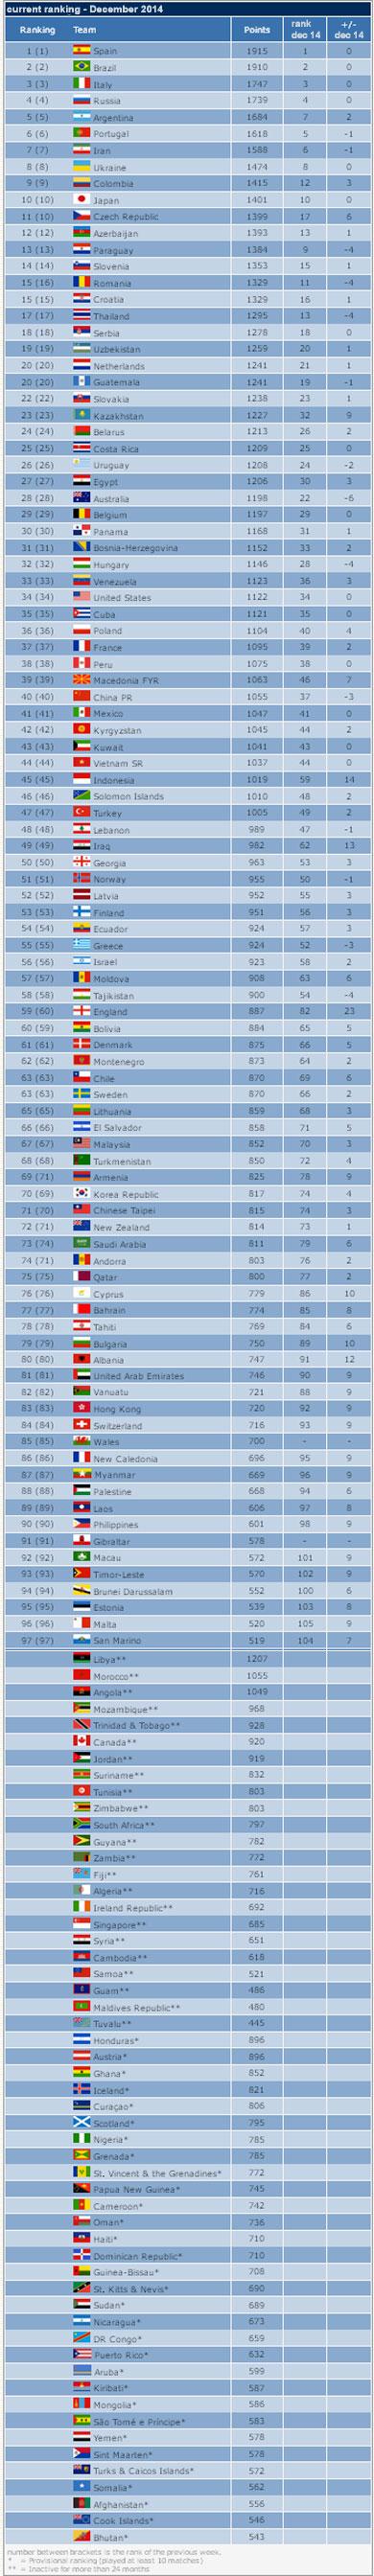 Wolrd Ranking 2014  (Fuente: Futsal World Ranking)